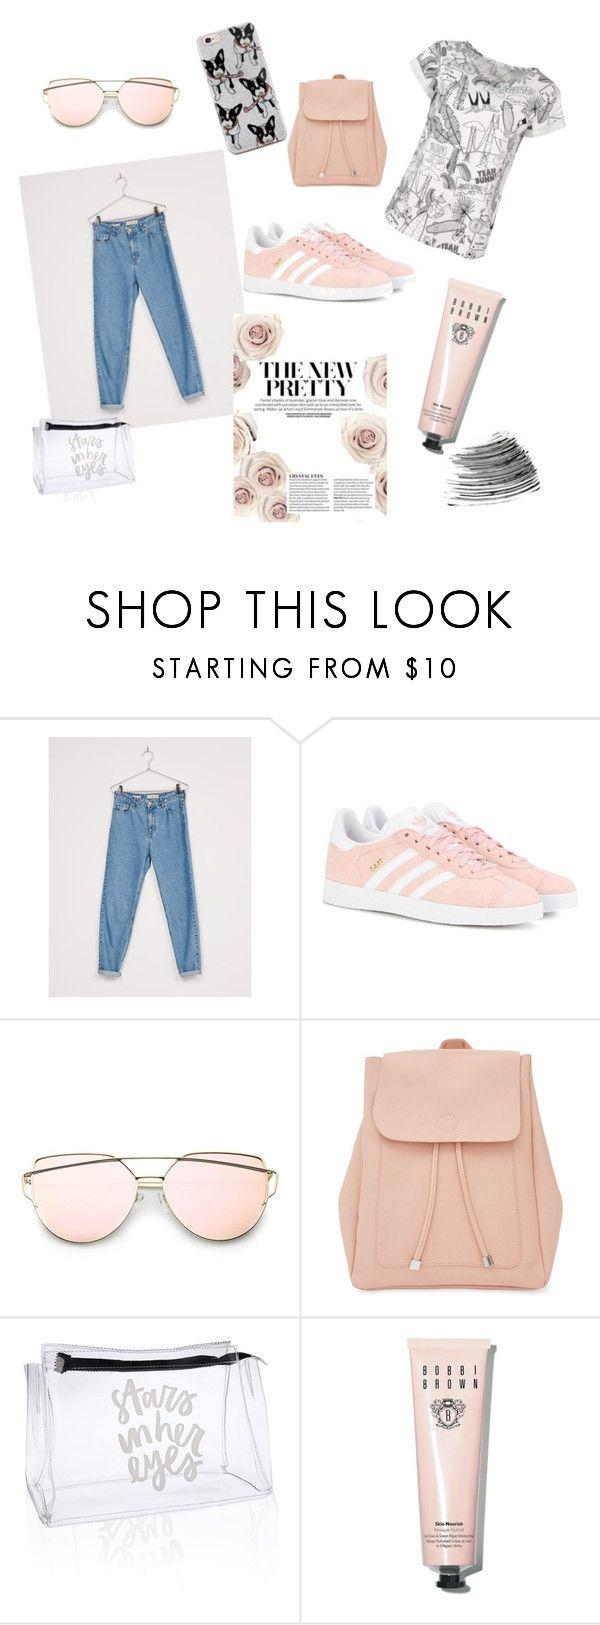 """YB Drawing"" by ellesdi on Polyvore featuring moda, Bershka, adidas Originals, New Look i Bobbi Brown Cosmetics"